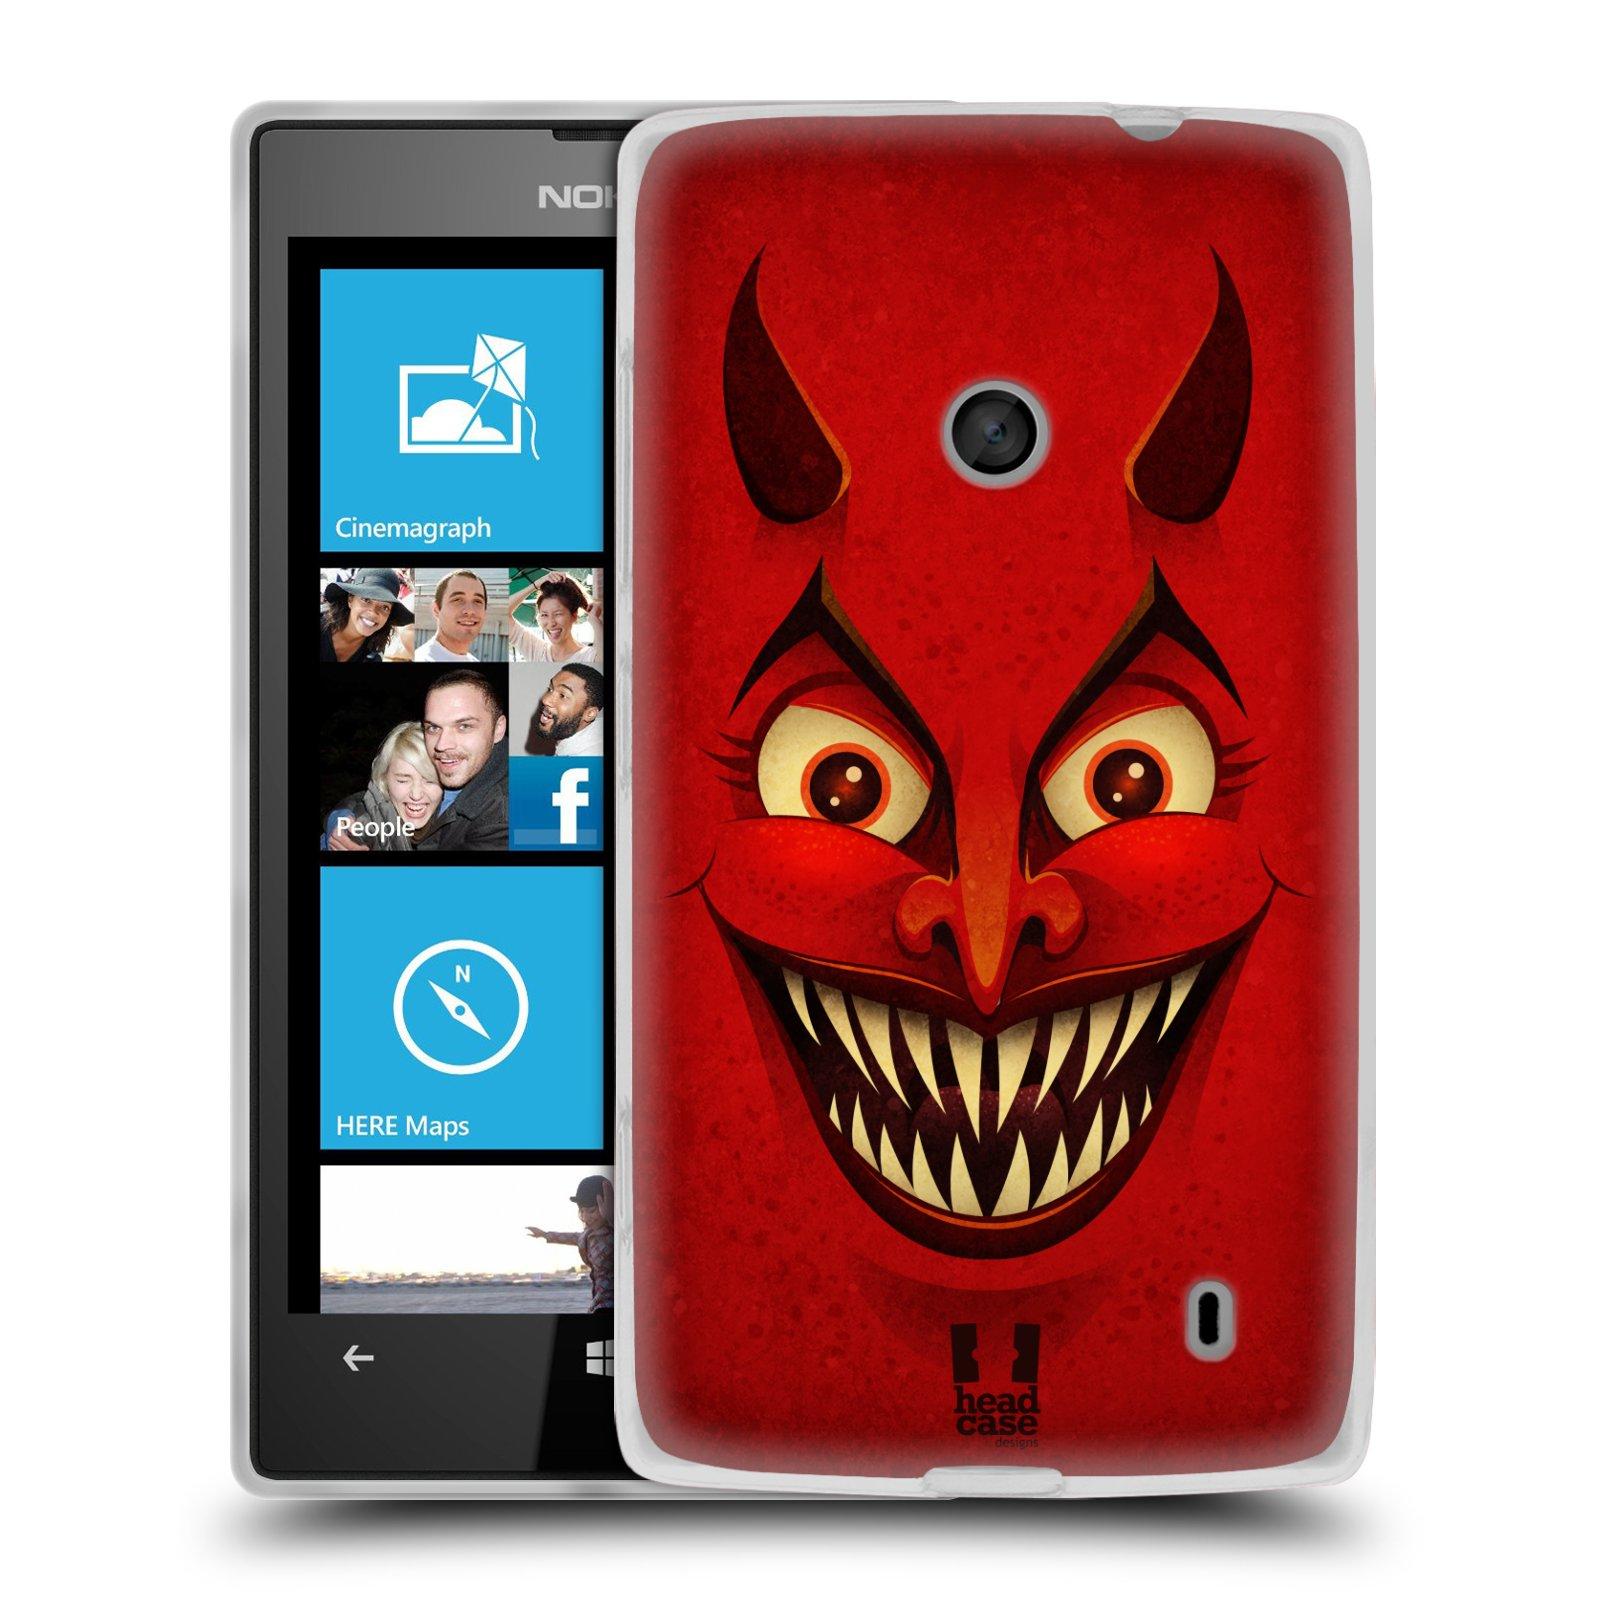 Silikonové pouzdro na mobil Nokia Lumia 520 HEAD CASE ČERT (Silikonový Kryt či obal na mobilní telefon Nokia Lumia 520)